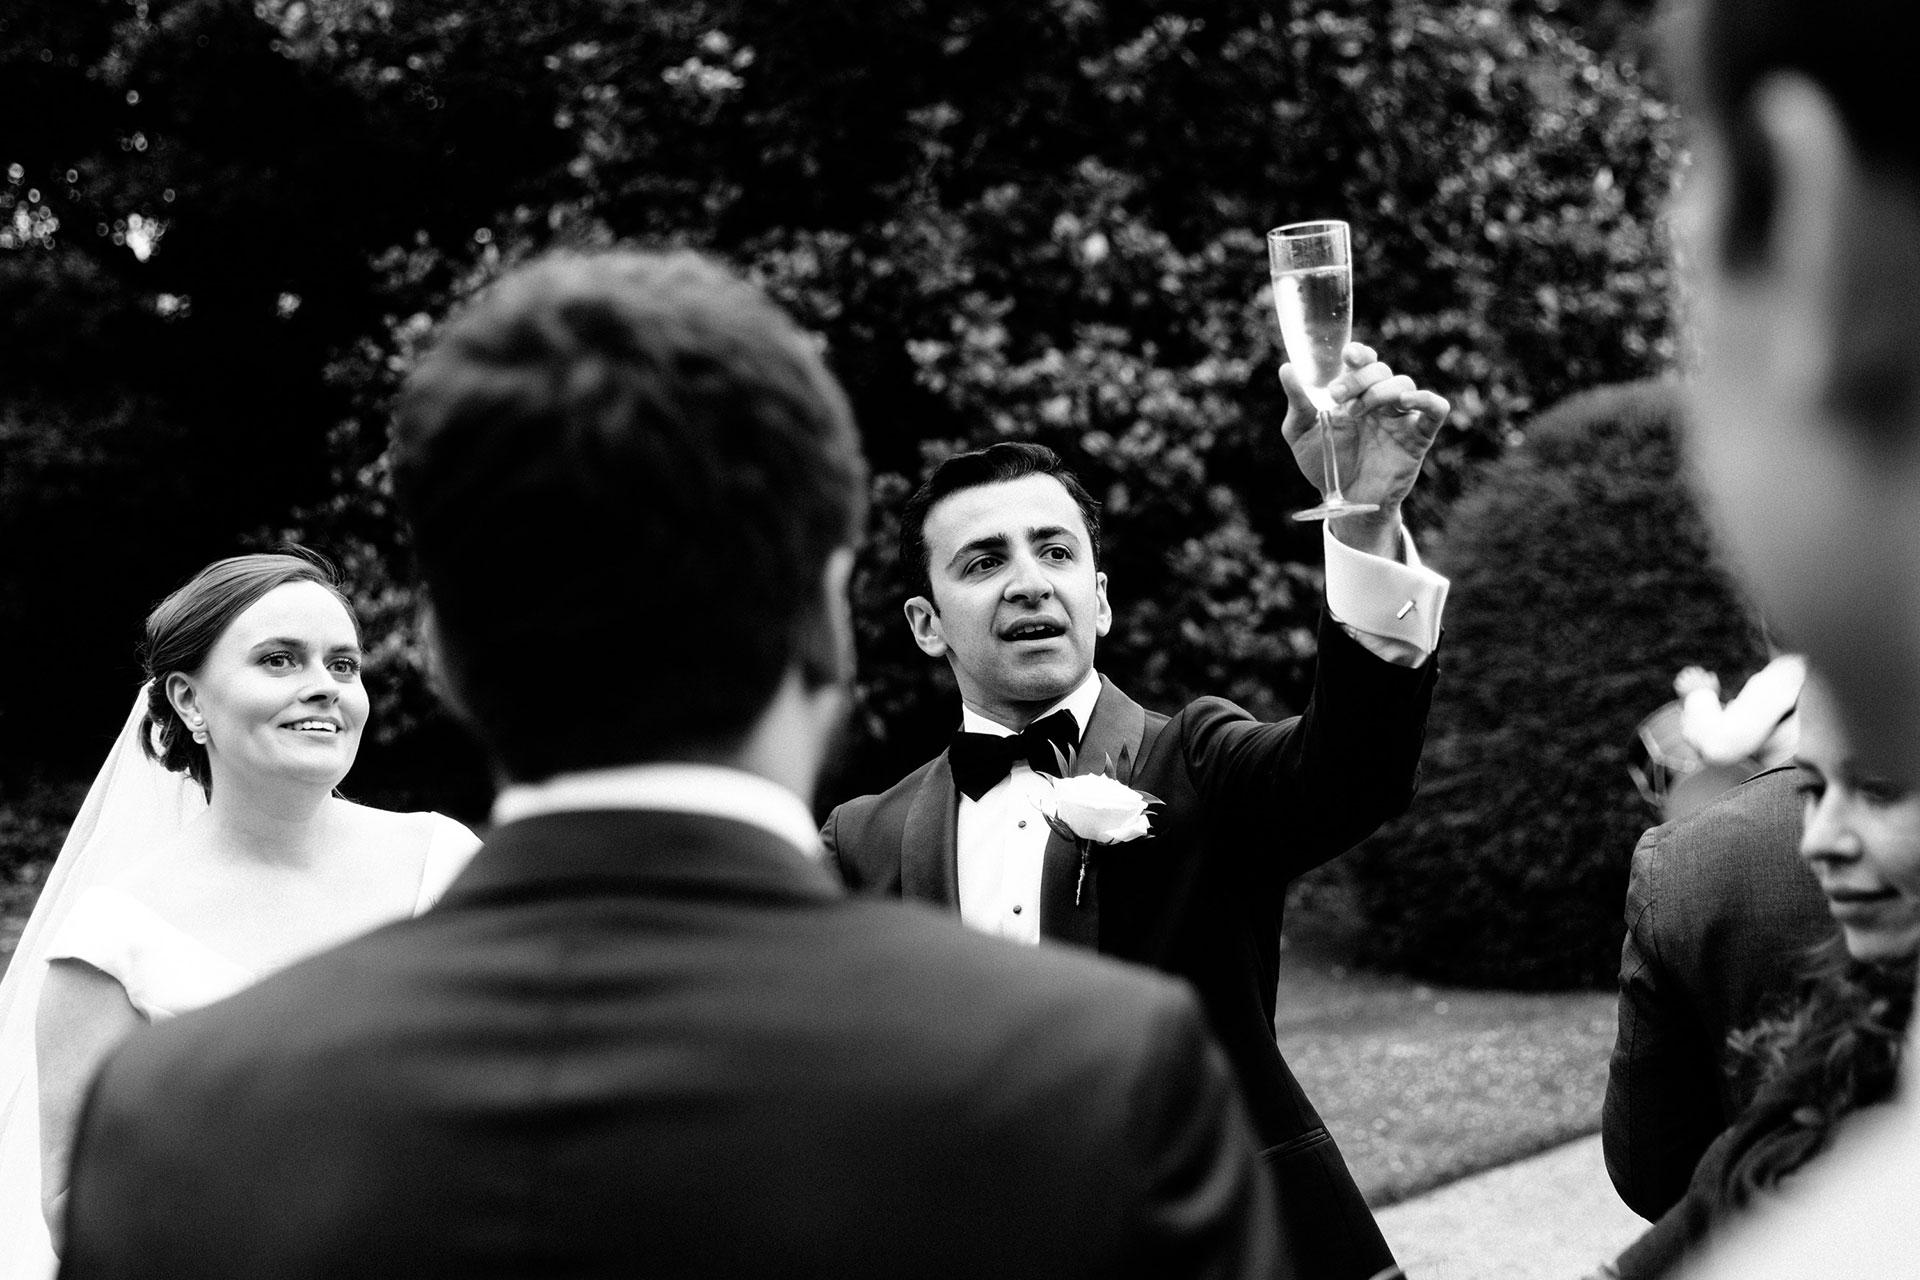 Syon-Park-Wedding-Photographer--_-Michael-Newington-Gray-242.jpg